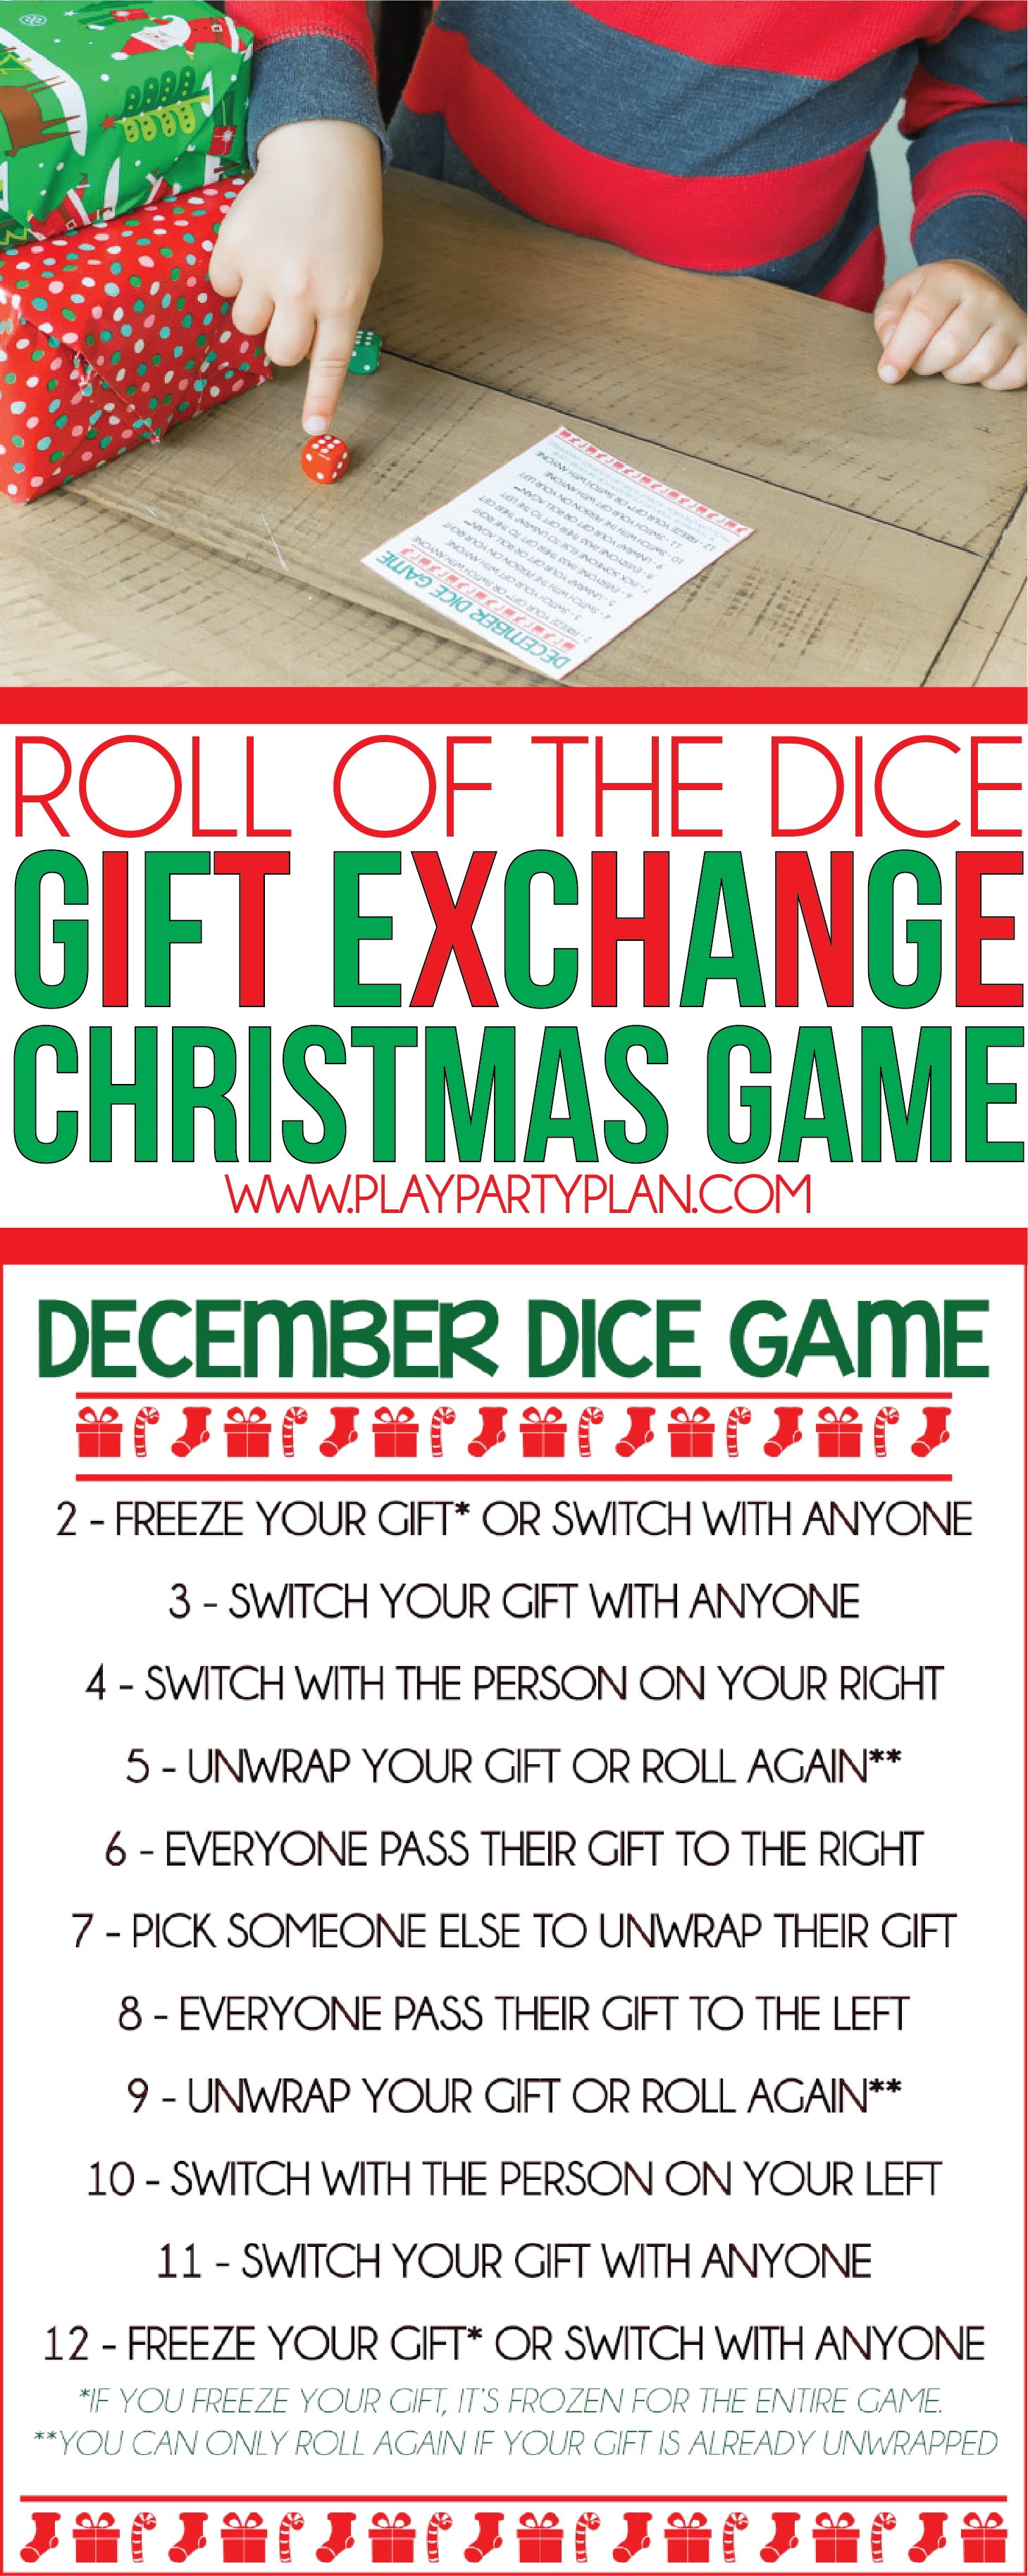 10 Great Creative Christmas Gift Exchange Ideas 10 creative gift exchange games you absolutely have to play 2 2021